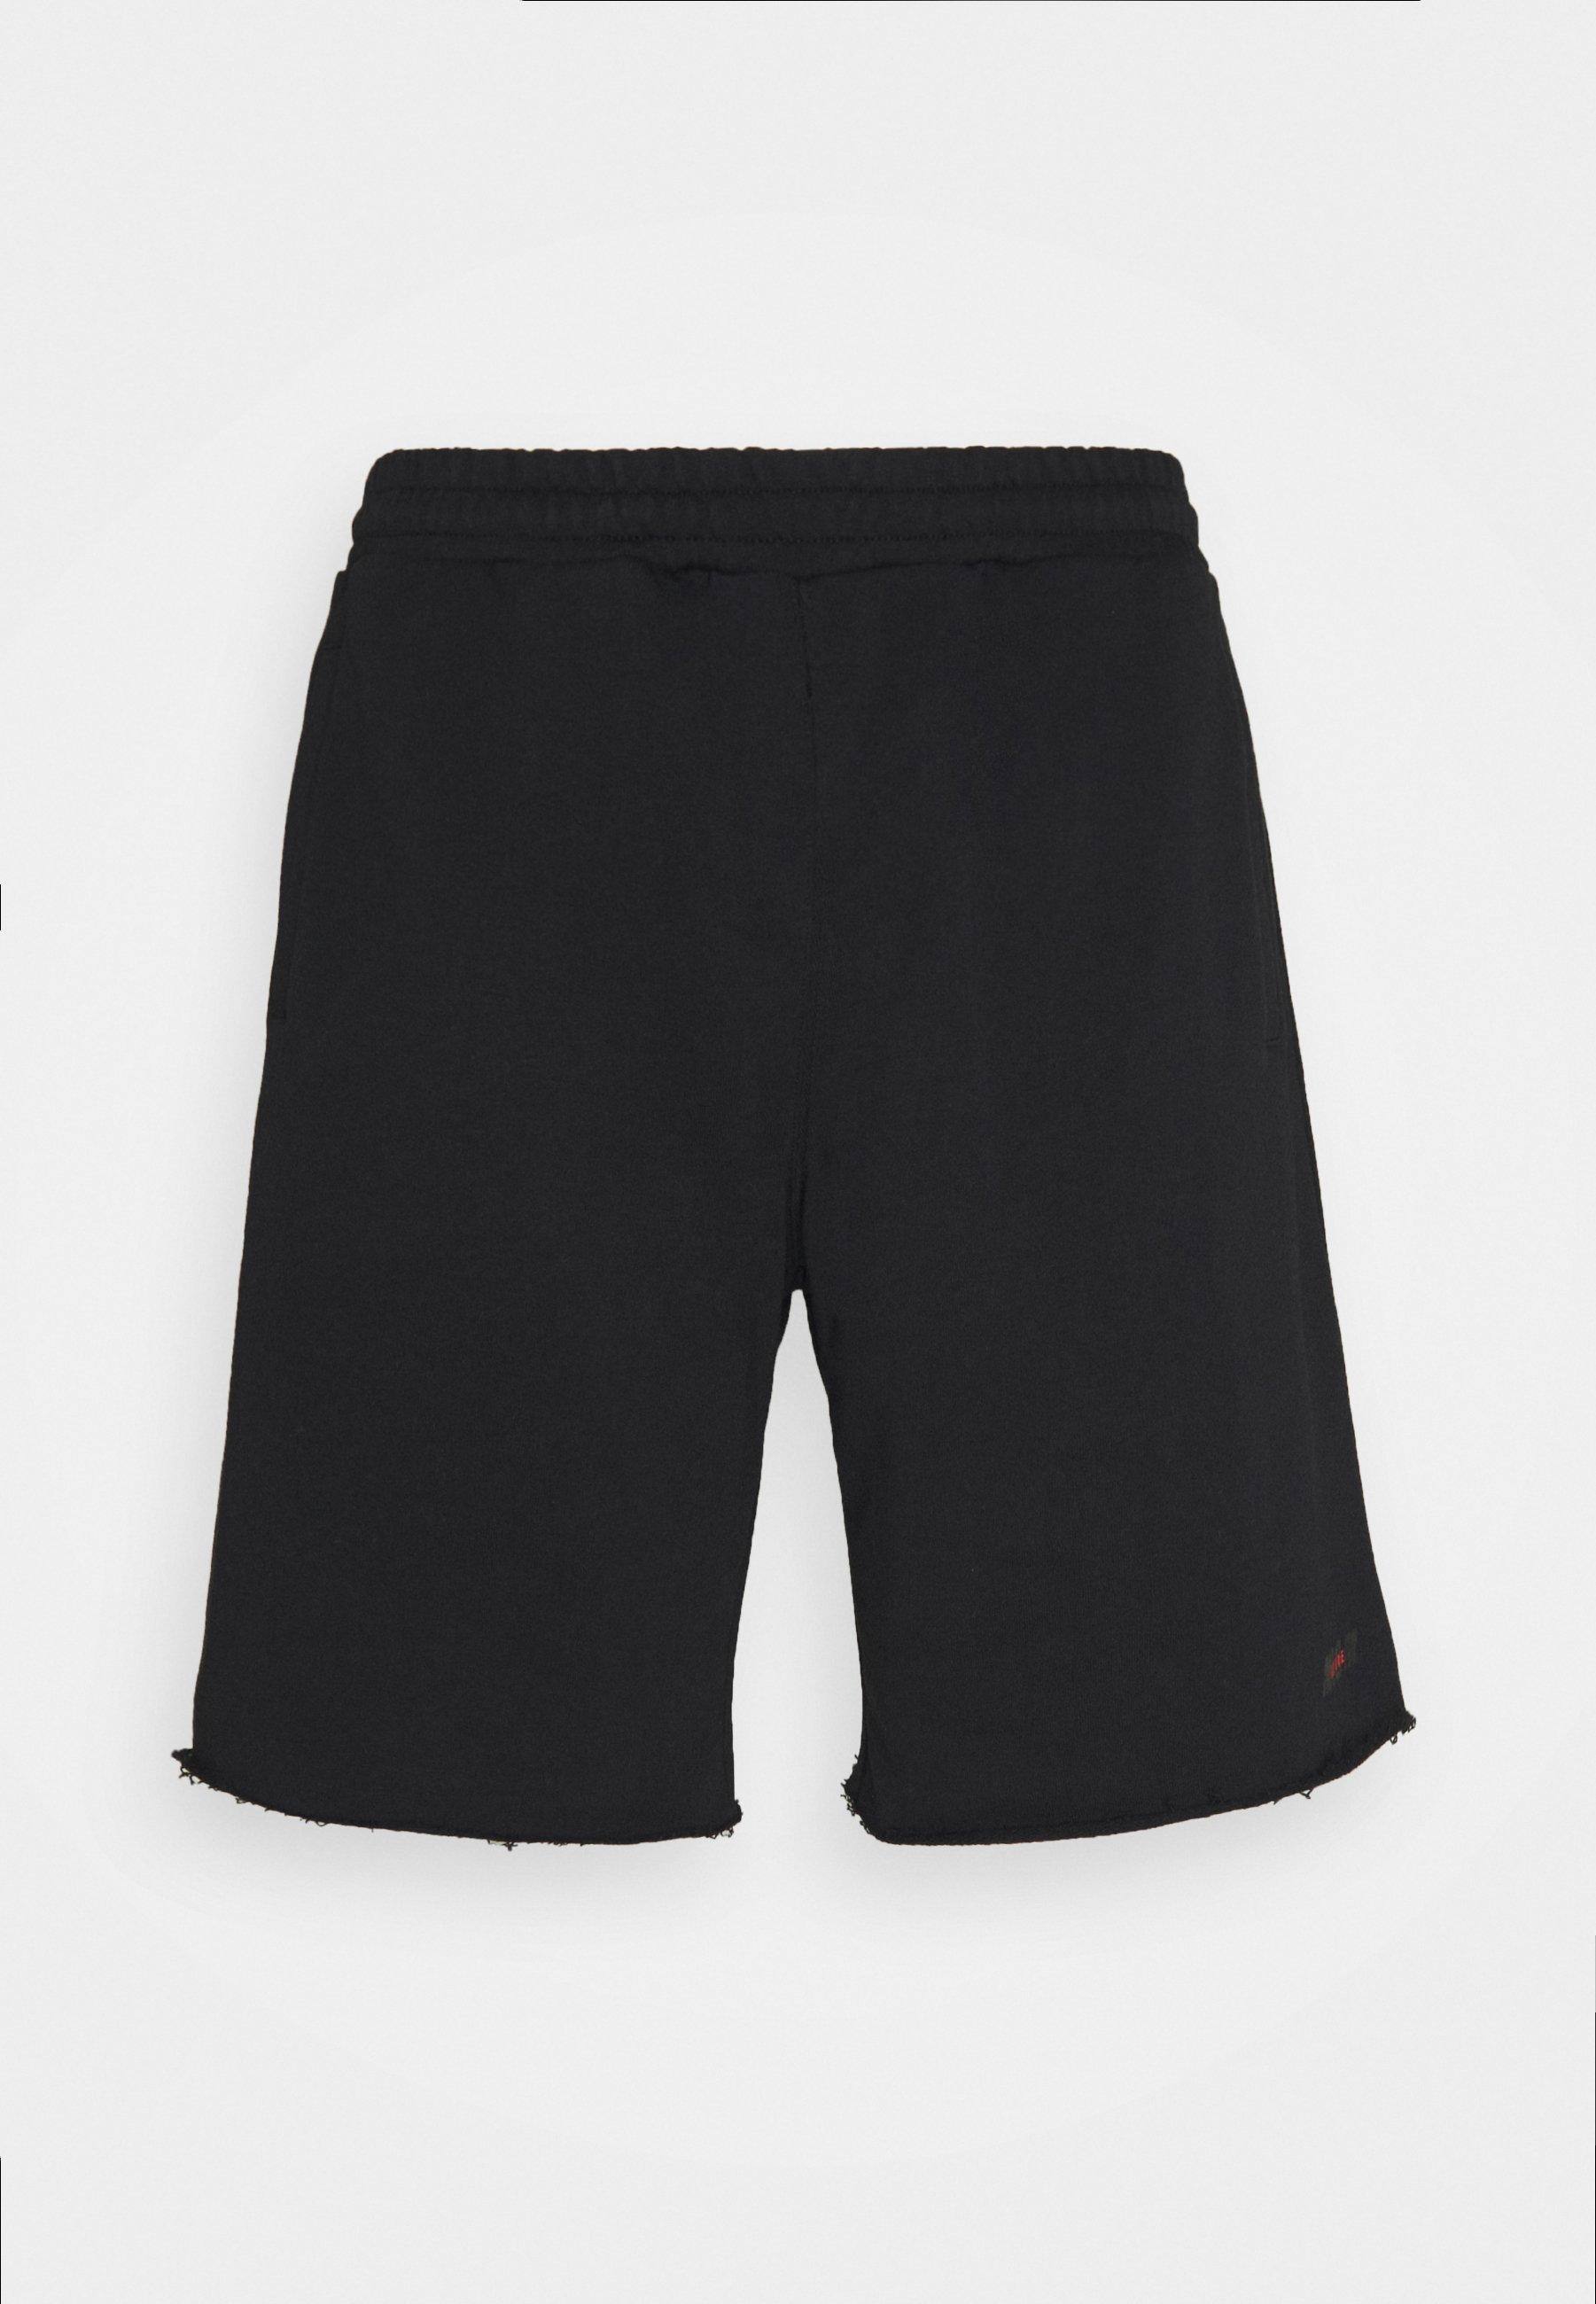 Homme BERMUDA SHORTS - Short de sport